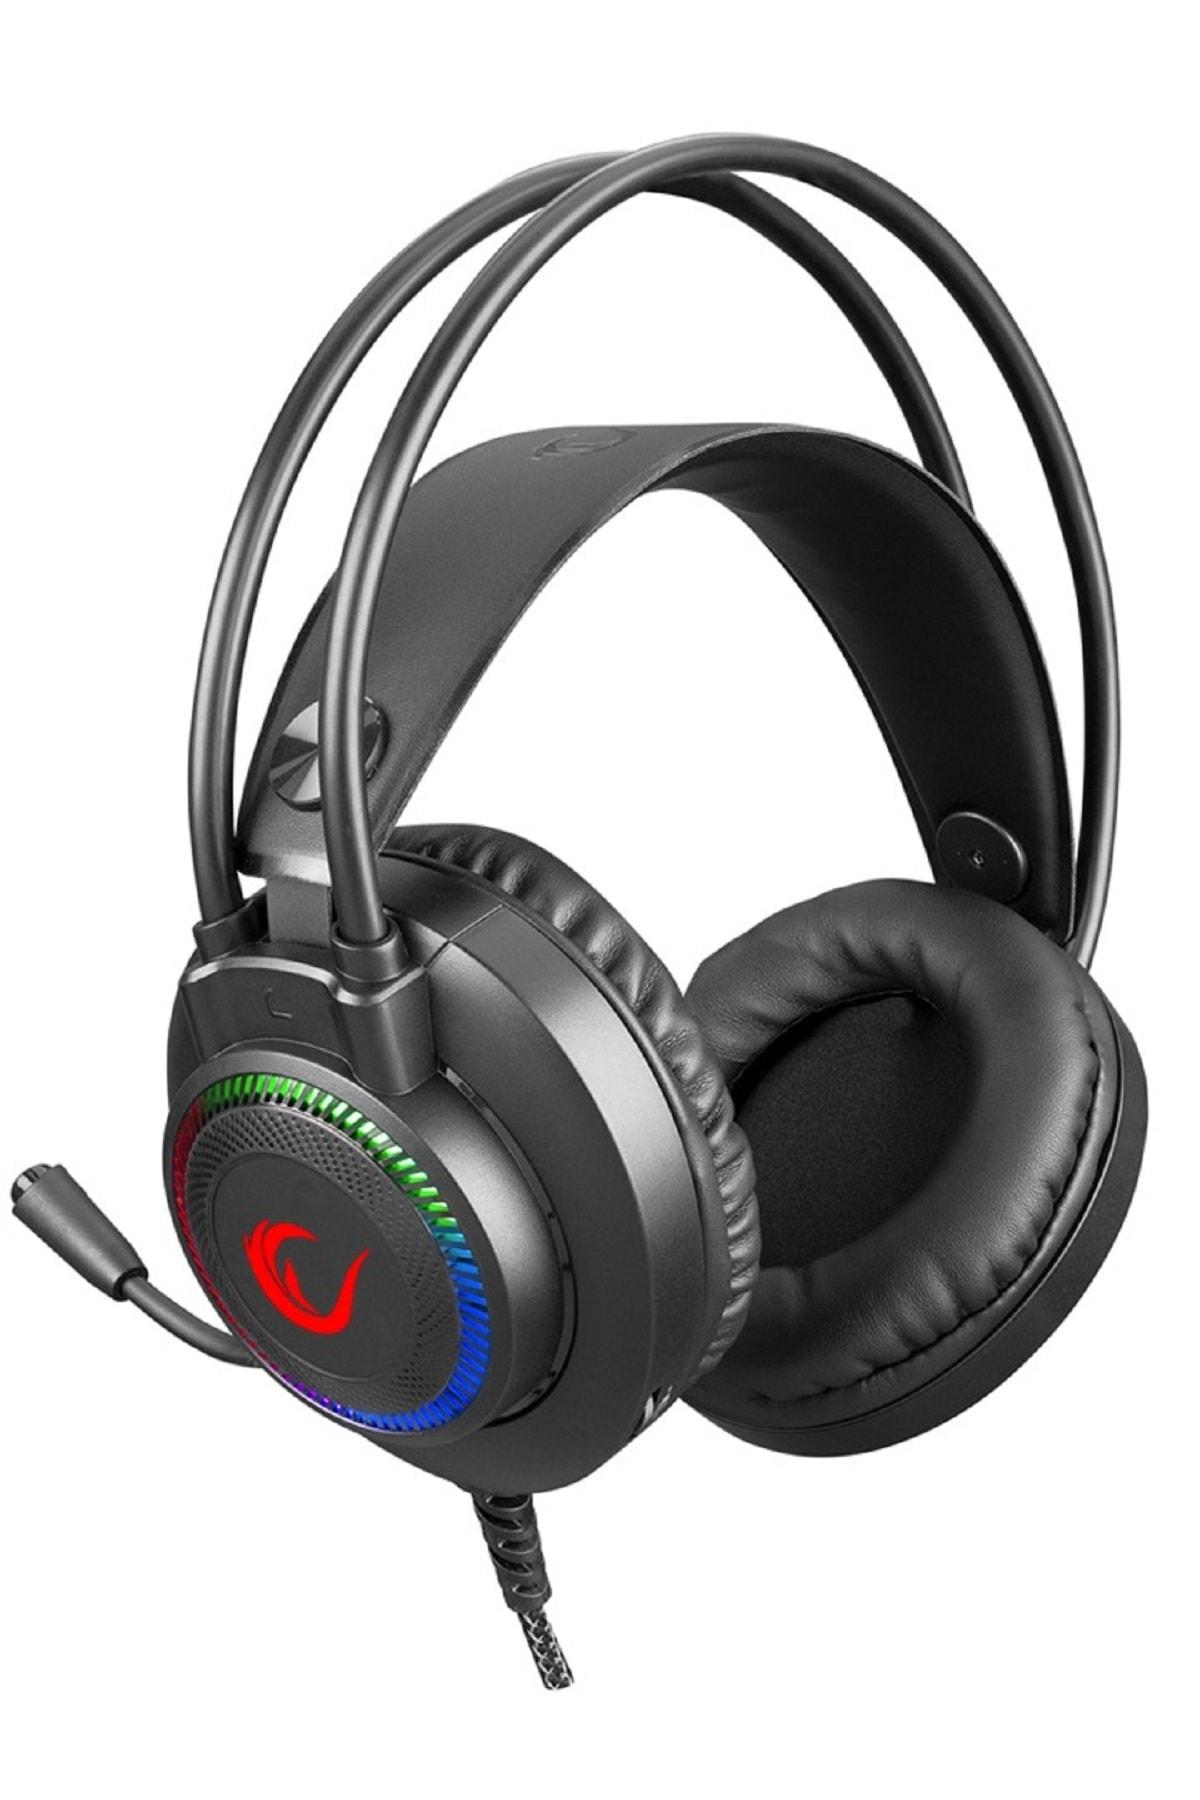 Rampage Rm-k27 X-jammer 3,5 Mm 7 Renk Ledli Gaming Oyuncu Mikrofonlu Kulaklık 1